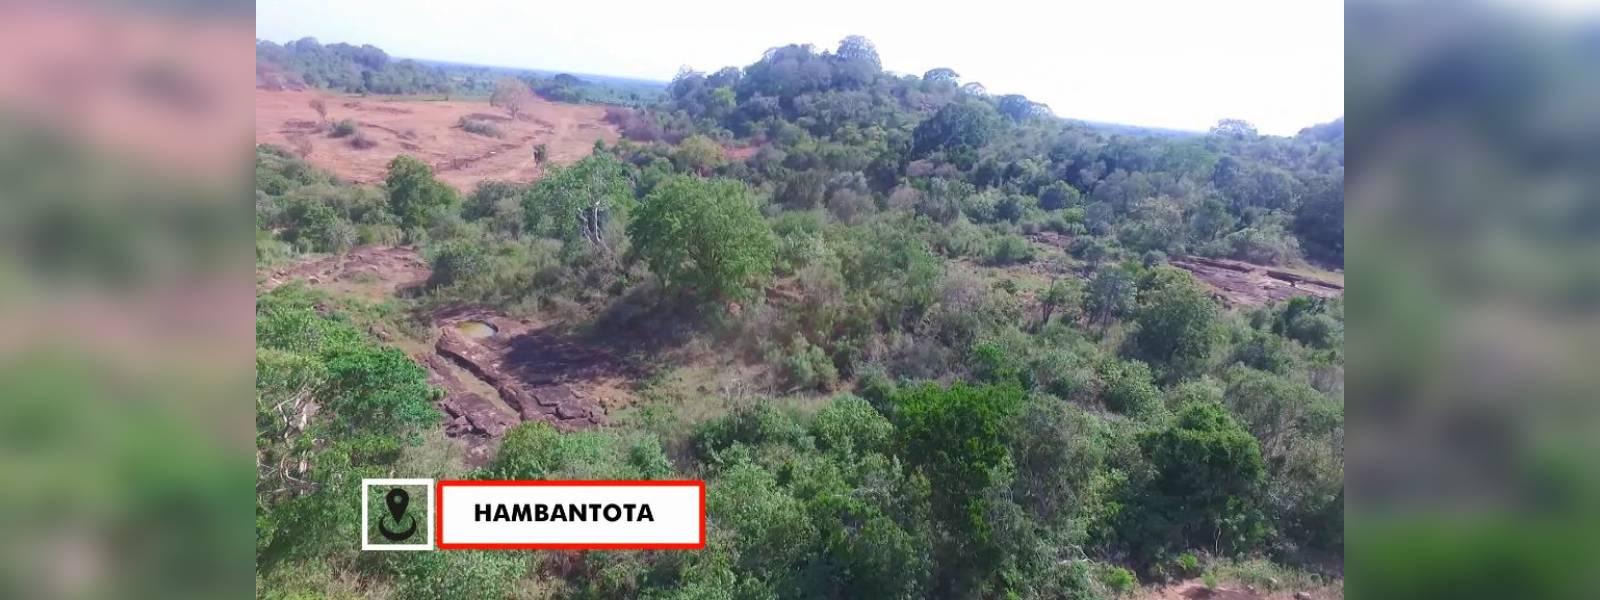 Residents complain of deforestation on proposed elephant reserve in Hambantota